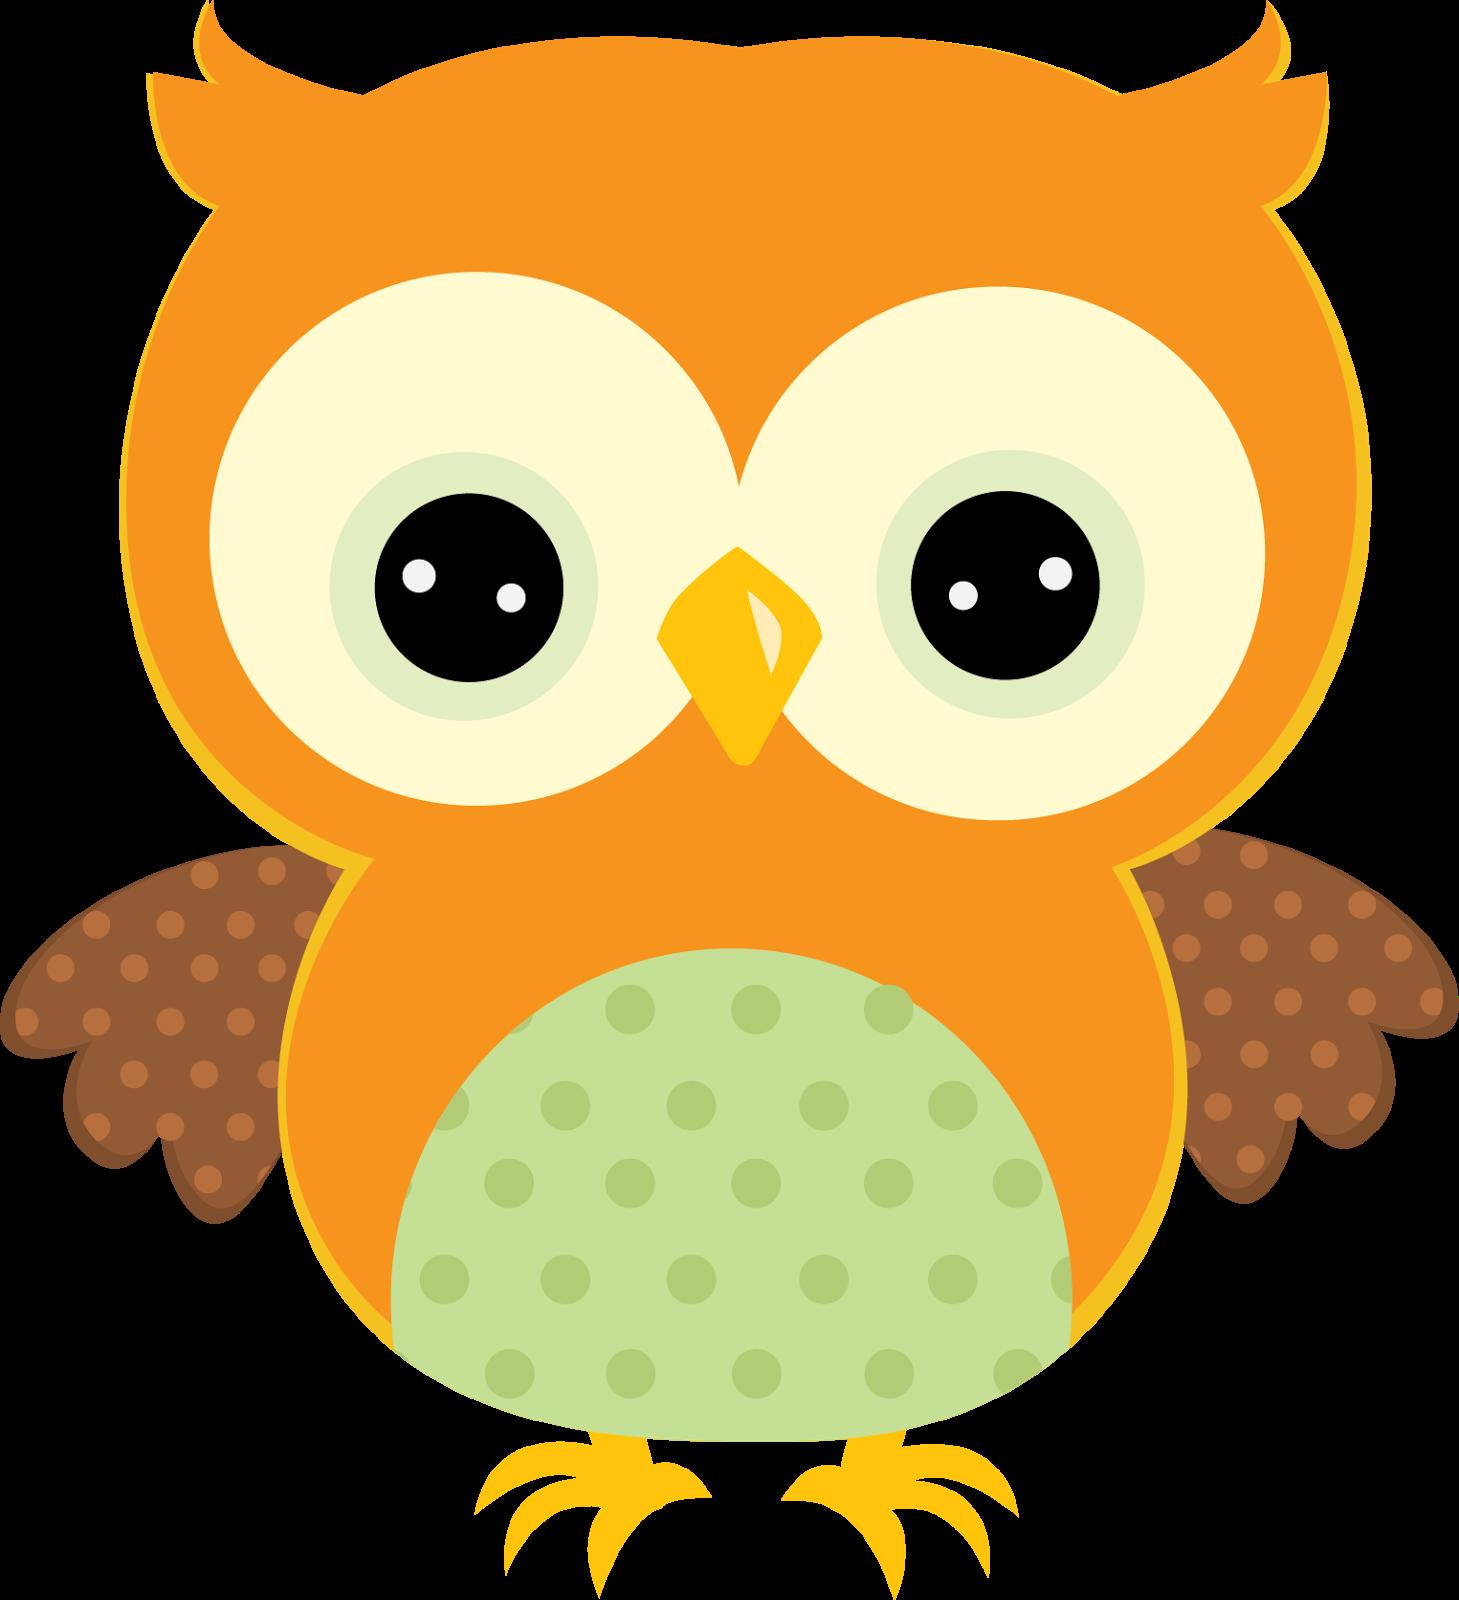 Owl and pumpkin clipart jpg transparent stock Gifs y Fondos PazenlaTormenta: IMÁGENES DE BÚHOS | aula | Pinterest ... jpg transparent stock